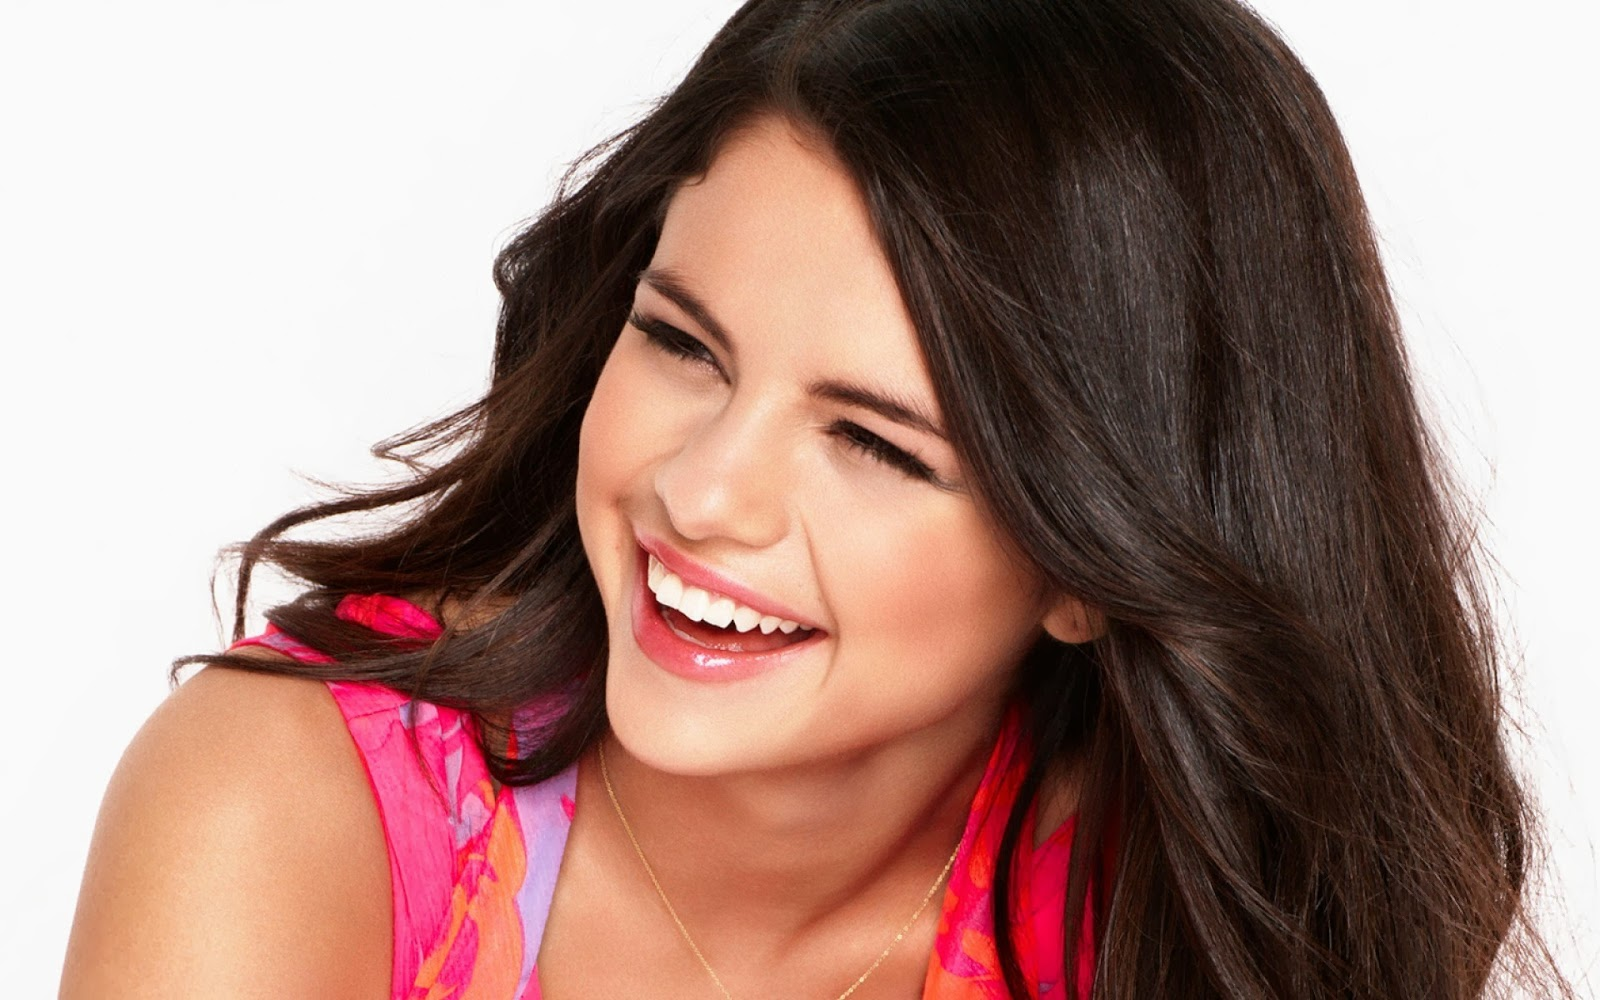 Katrina Kaif Cute Face Hd Wallpapers Celebrity Hd Wallpapers Selena Gomez Smiley Face Hd